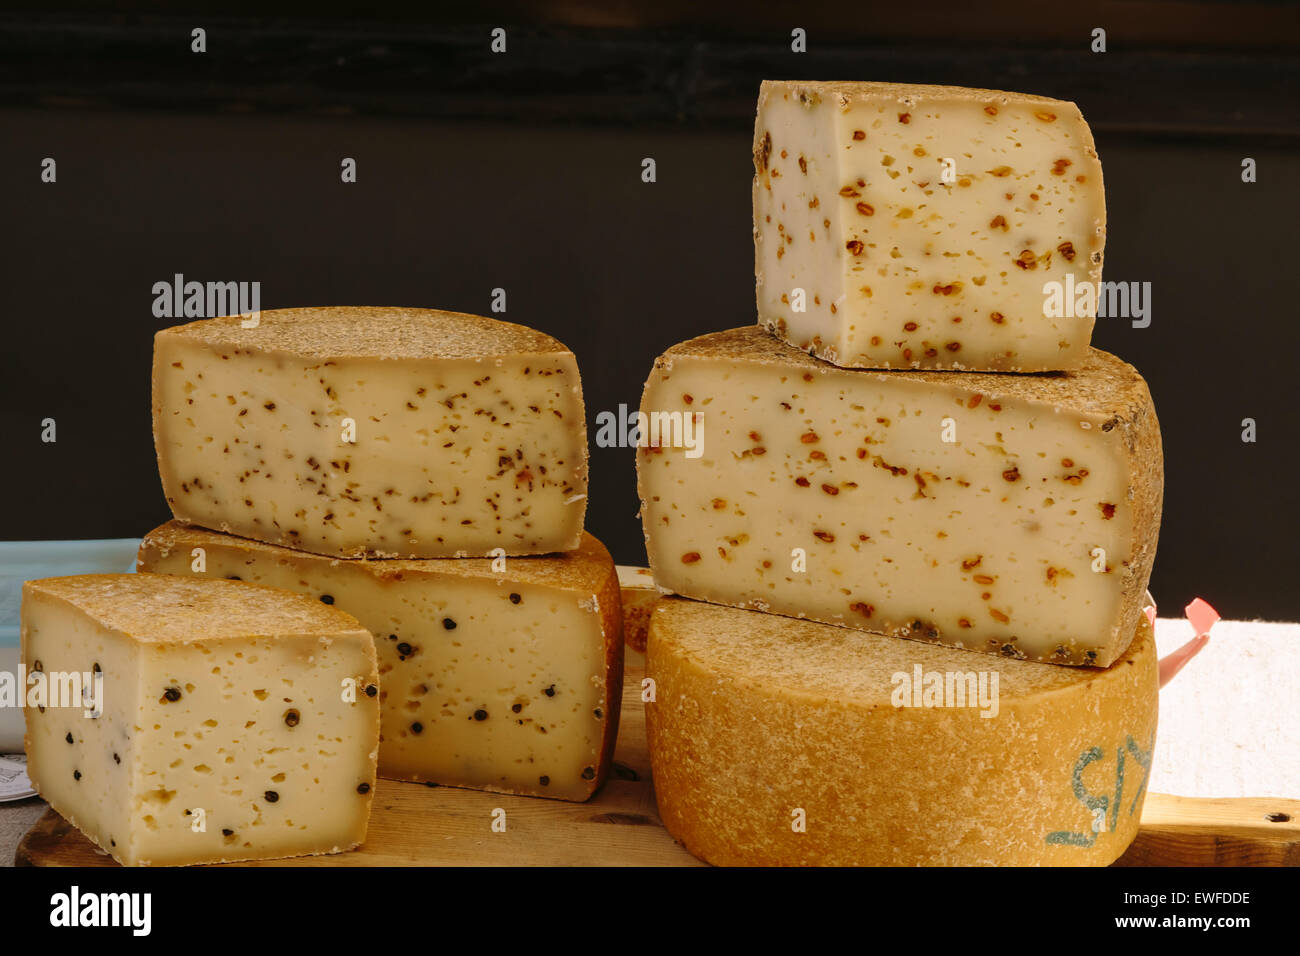 Vente de fromages letton, Farmer's Market, Bergs Bazaar, Riga Lettonie Photo Stock